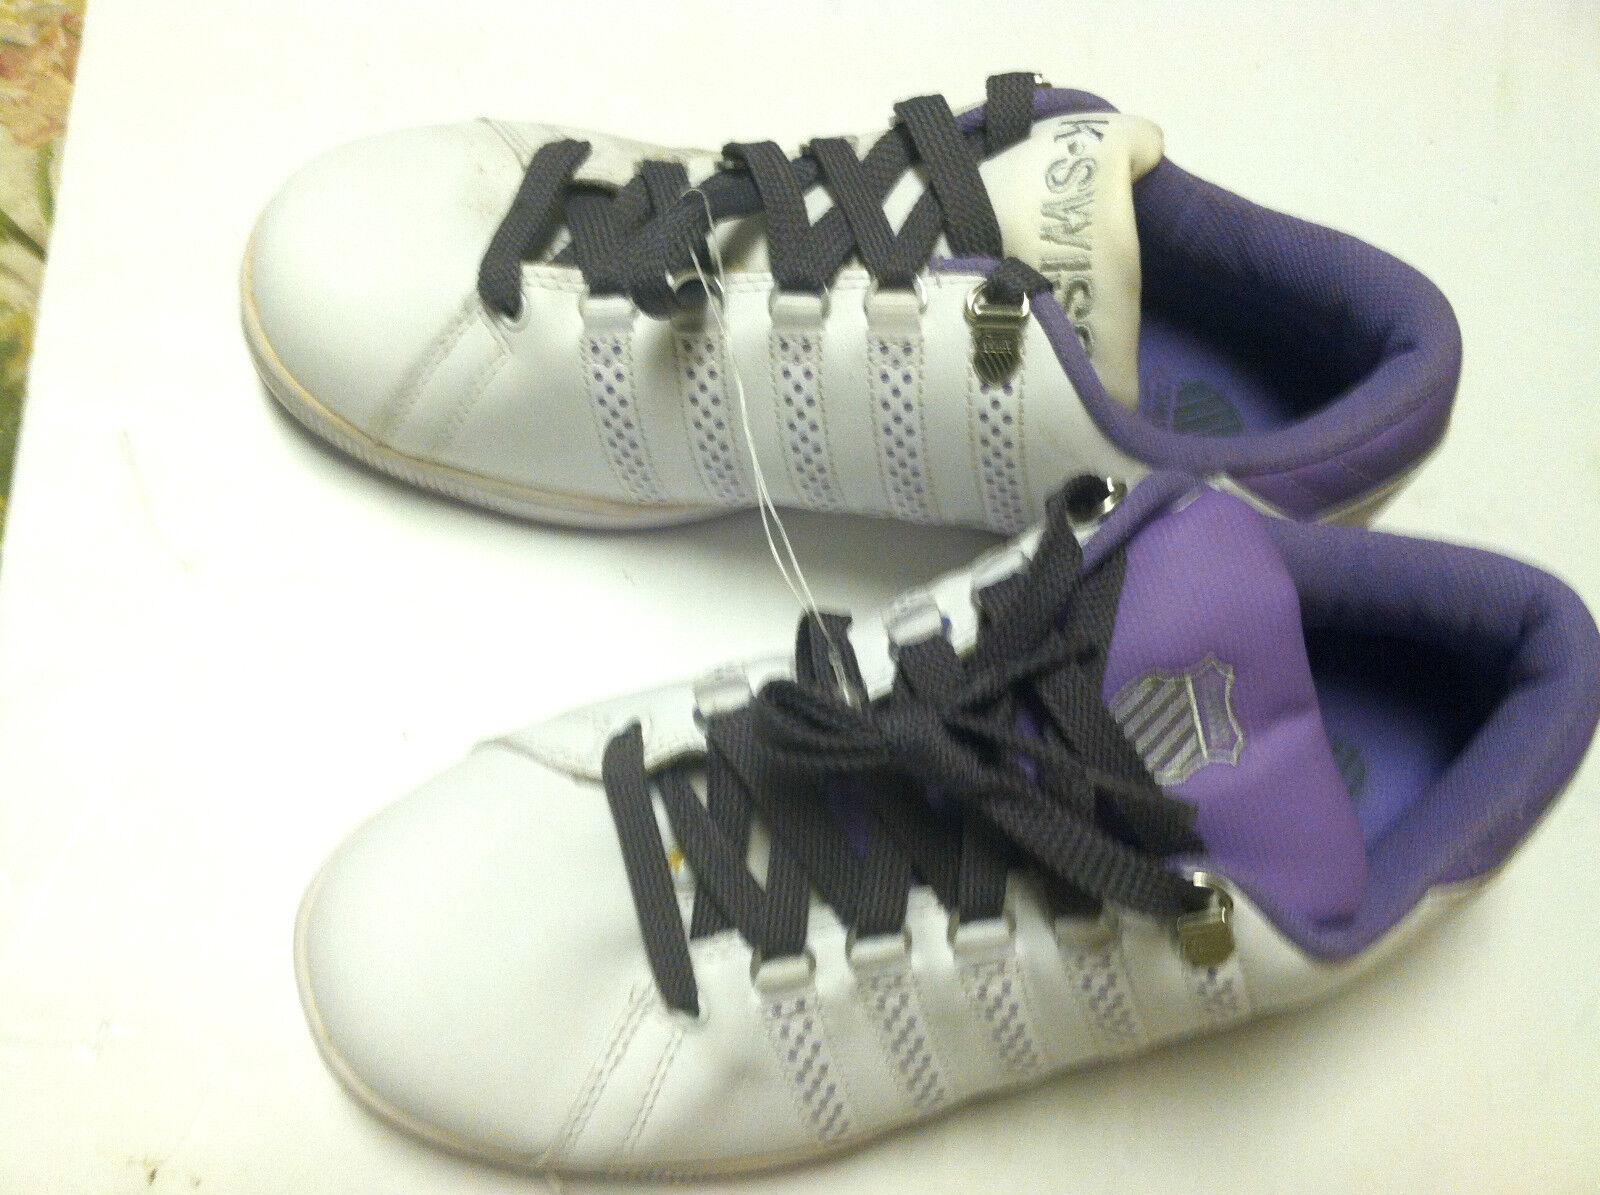 K-Swiss - Sneakers - Tongue Twister - Sz 10 - - - NWOB - B-SHO-12 8af8ba